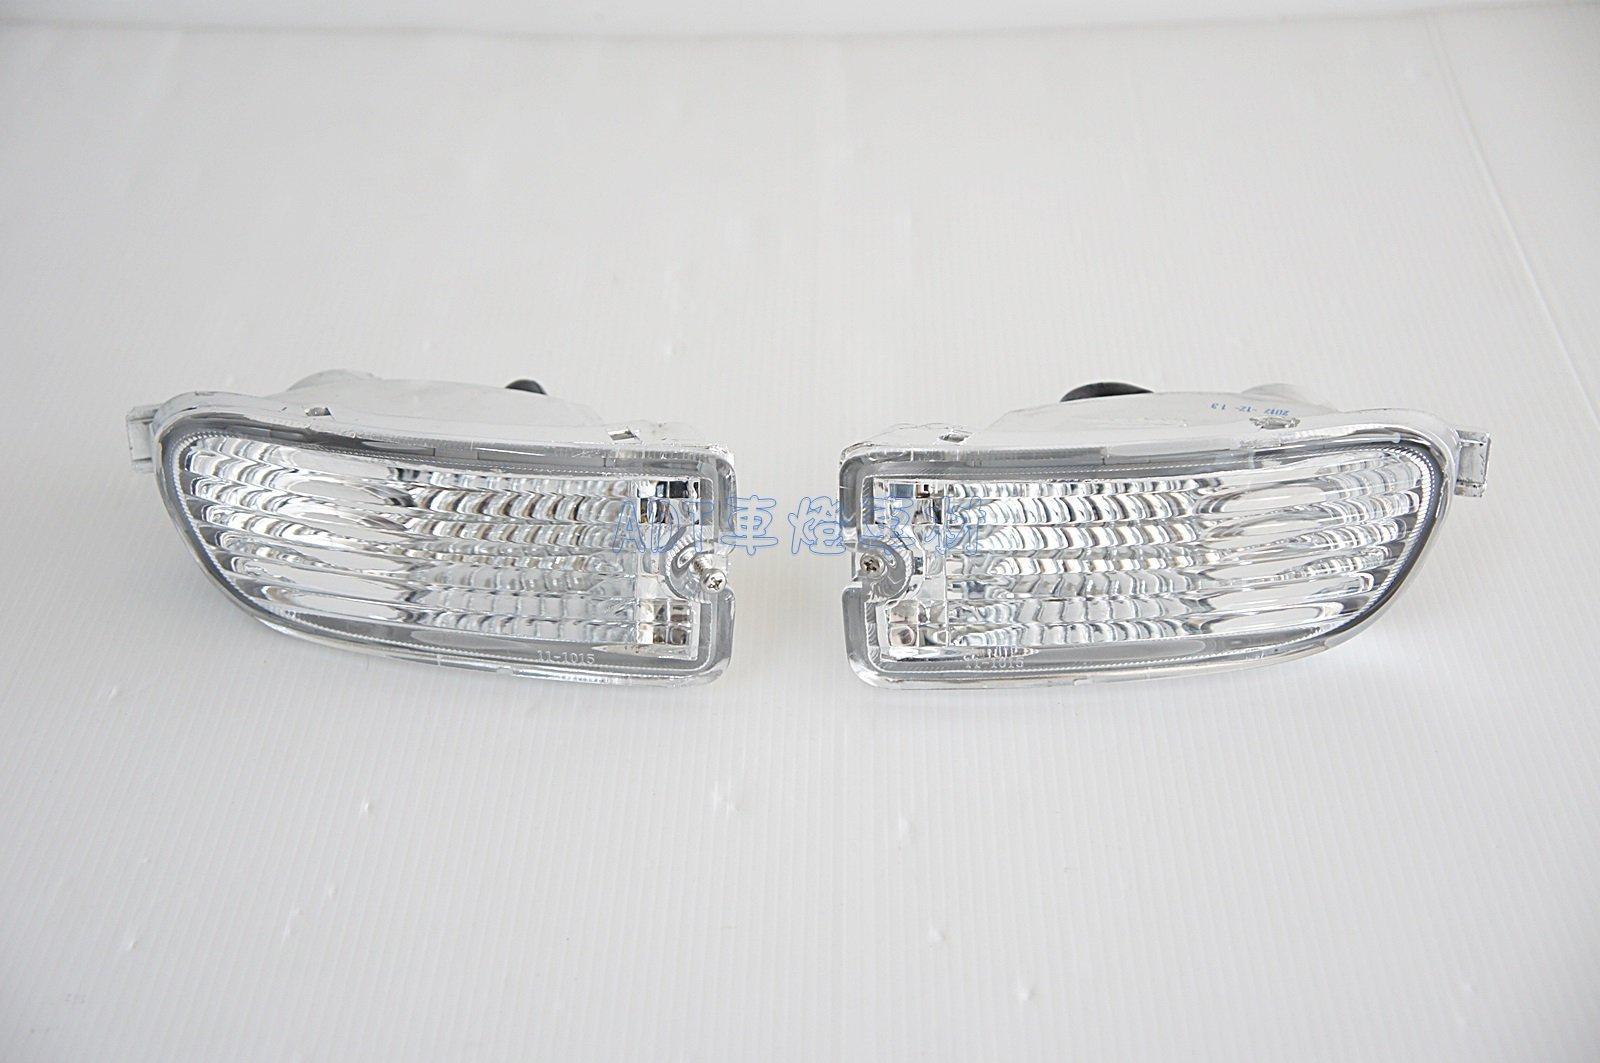 ~~ADT.車燈.車材~~大慶 WRX IMPREZA GC8 GF8 99 00 01 前保桿方向燈 晶鑽小燈